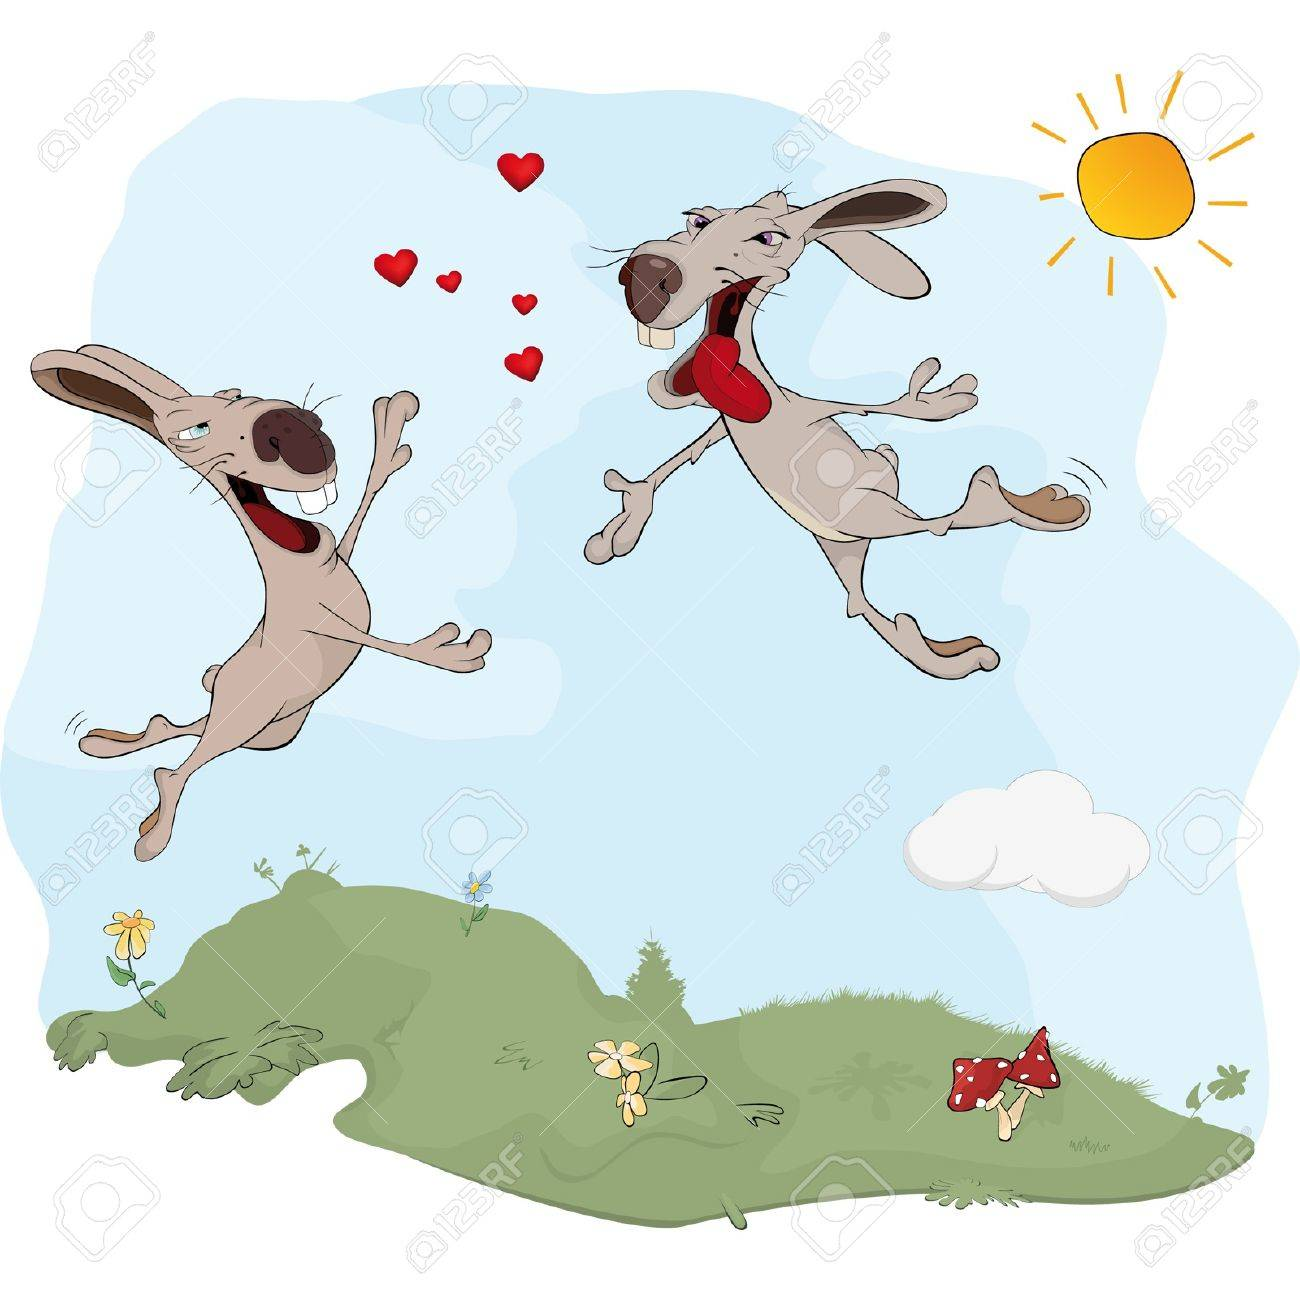 Rabbits and love. A meeting. Cartoon Stock Vector - 12484894